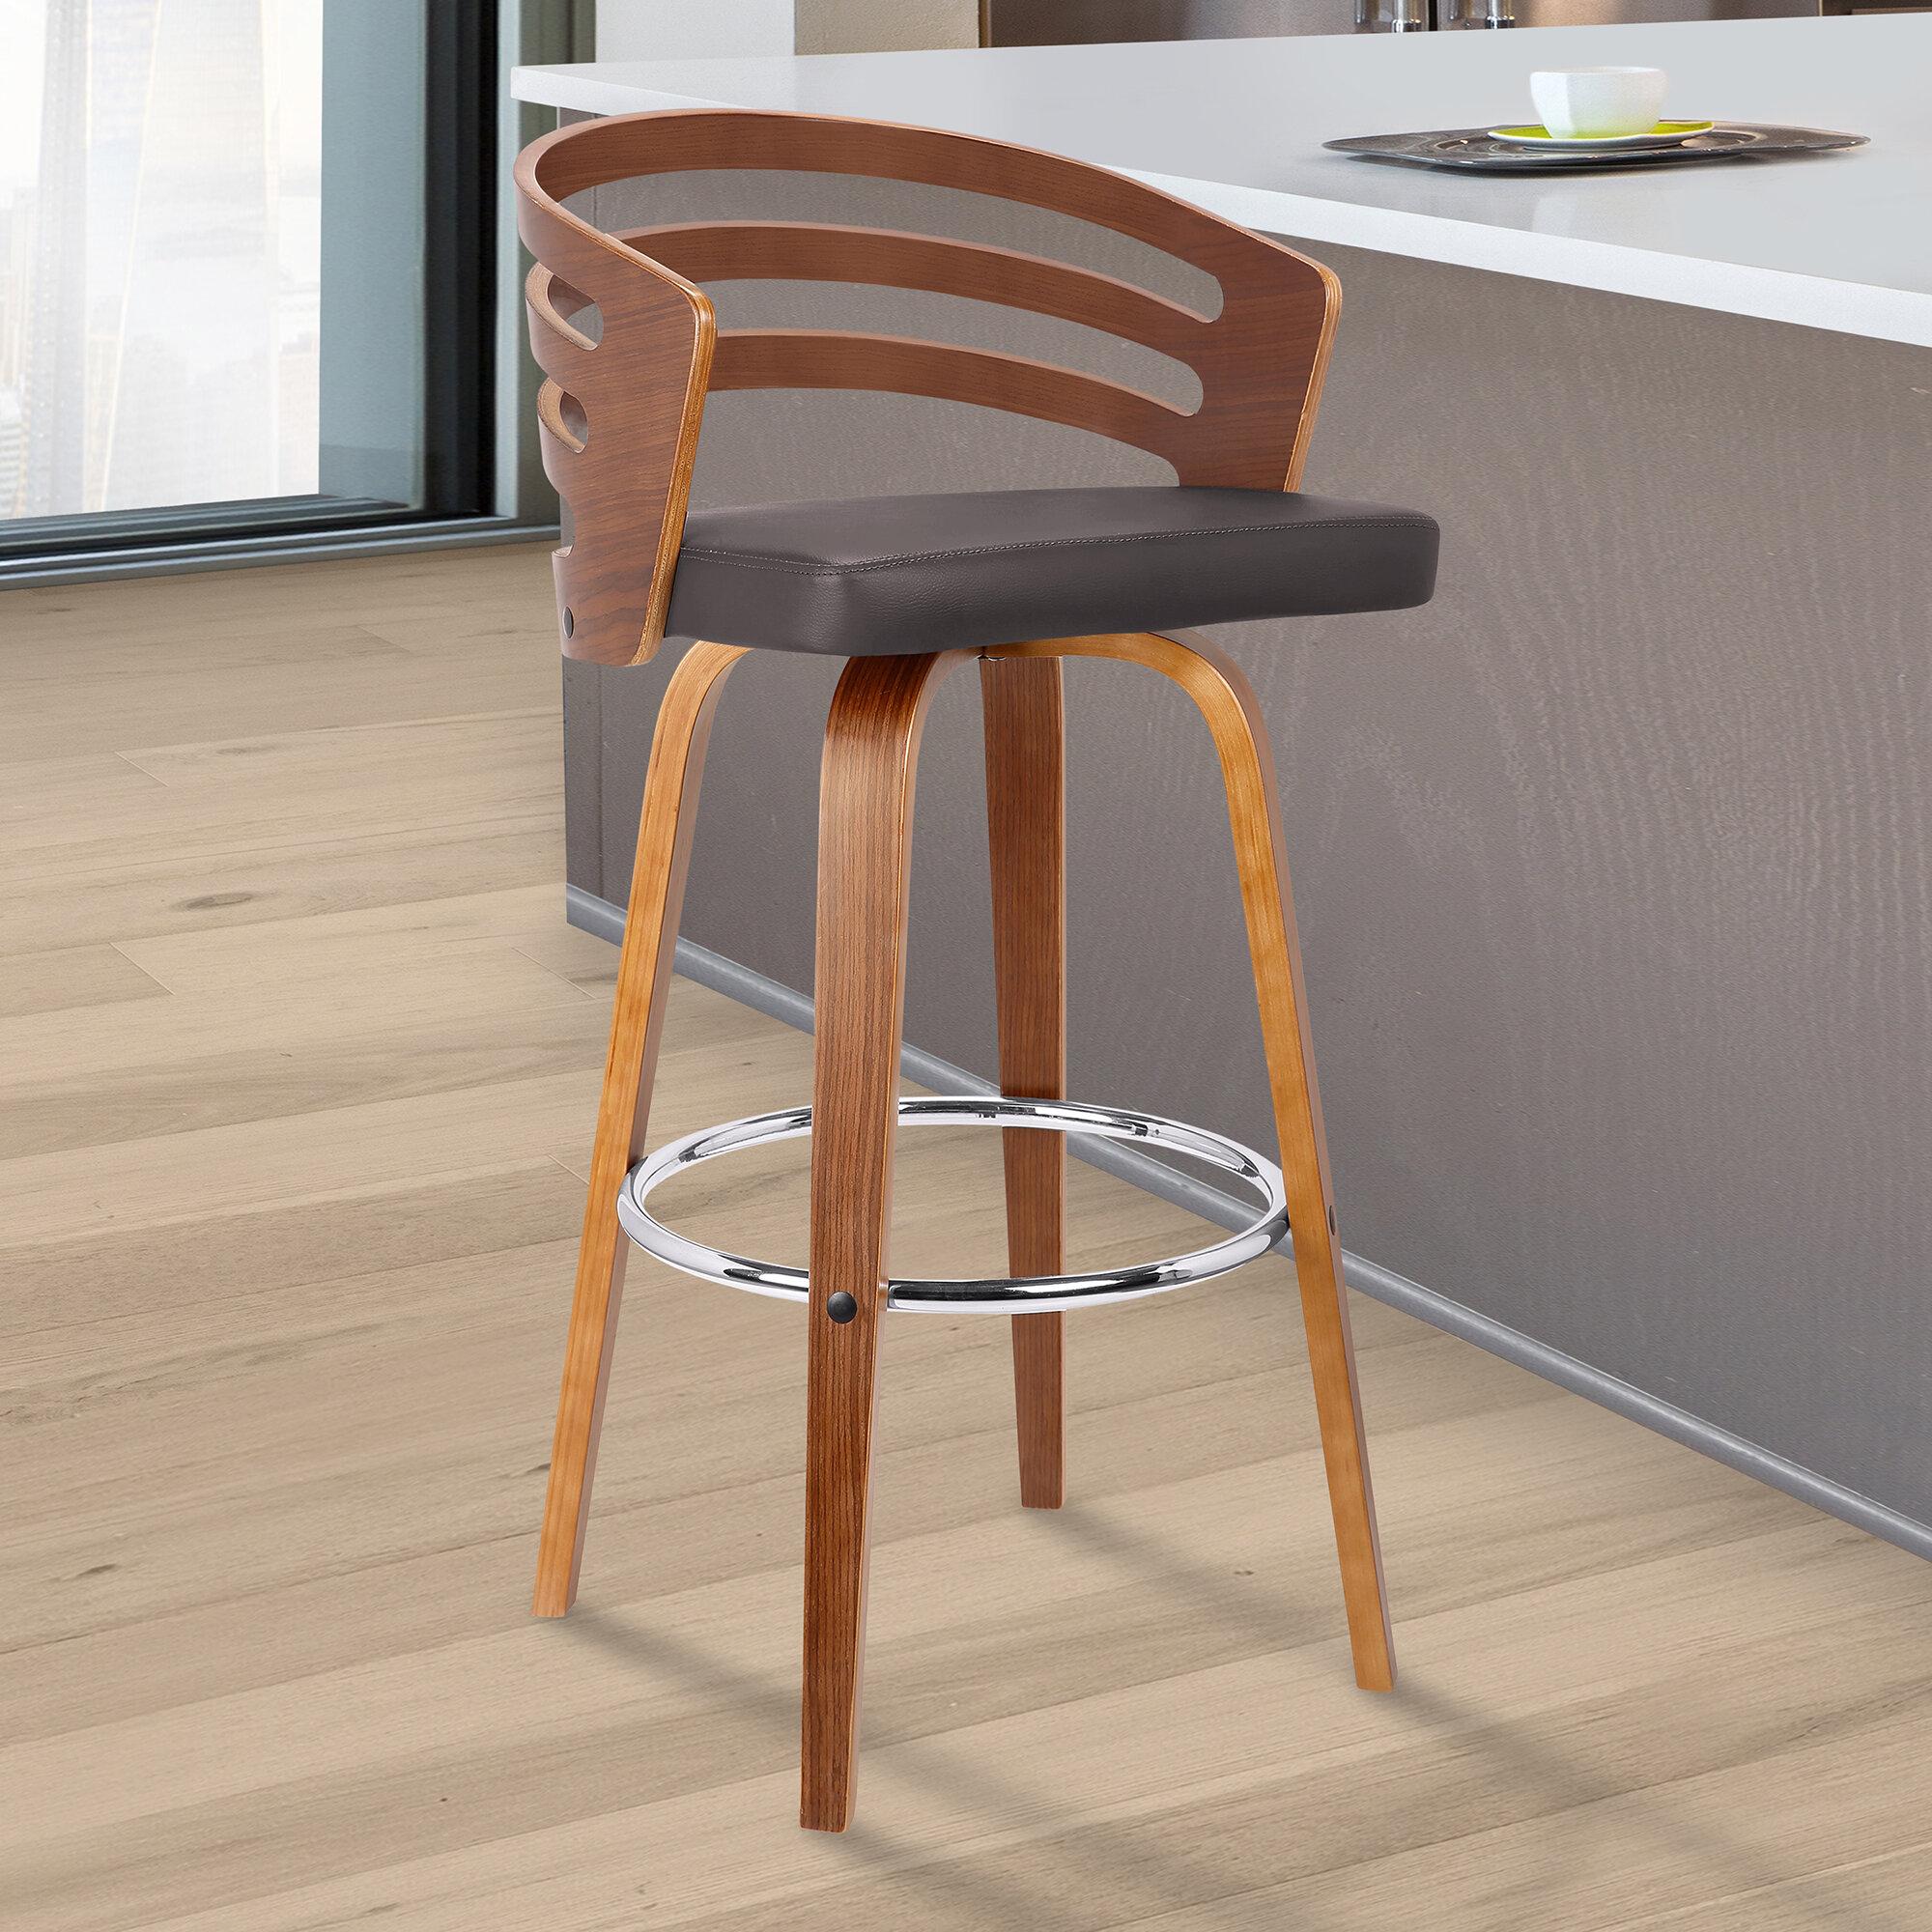 Incredible Wilkes Extra Tall Counter Swivel Stool Uwap Interior Chair Design Uwaporg